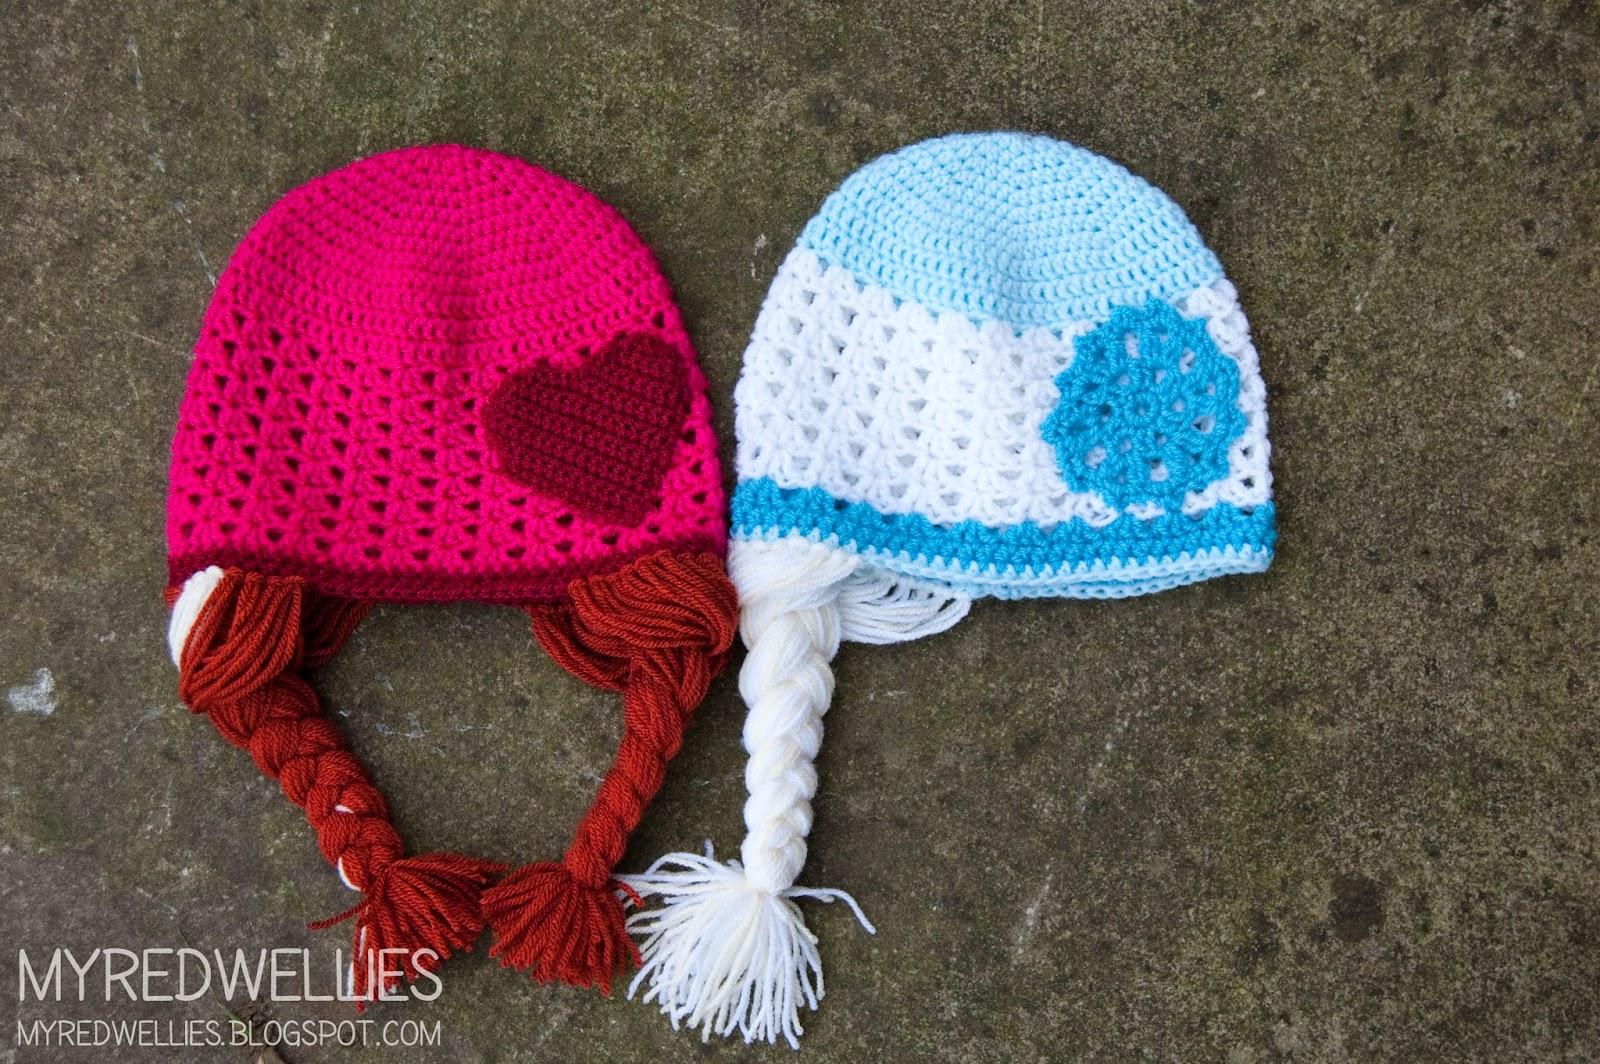 62ba067cc6f Anna   Elsa crochet hats - A free Crochet pattern